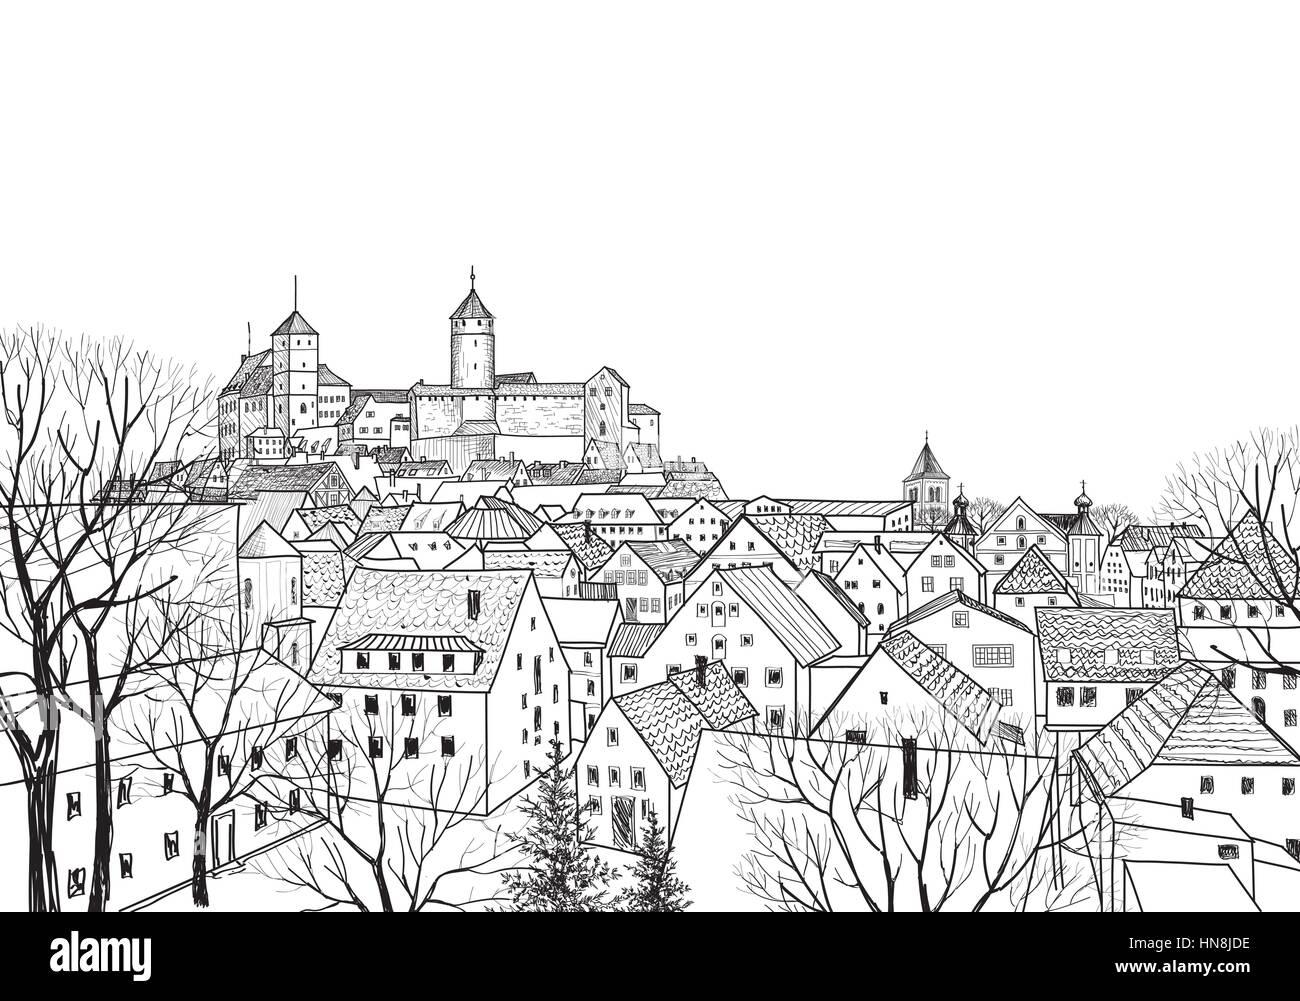 Old city view. Medieval european castle landscape. Pensil drawn vector sketch - Stock Vector